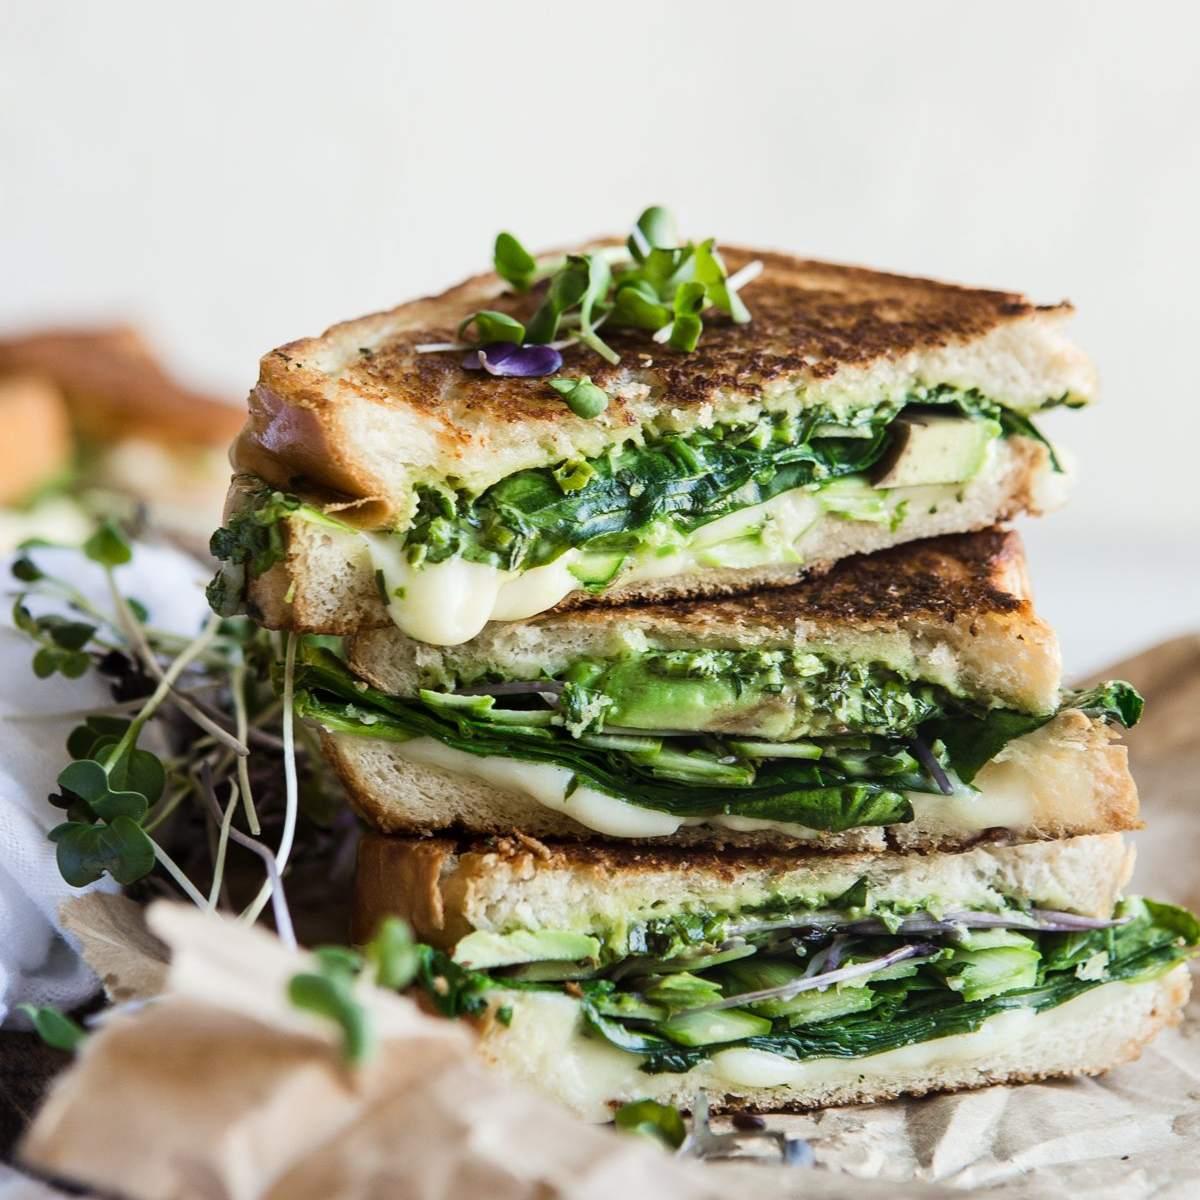 Sándwich de queso a la parrilla Green Goddess